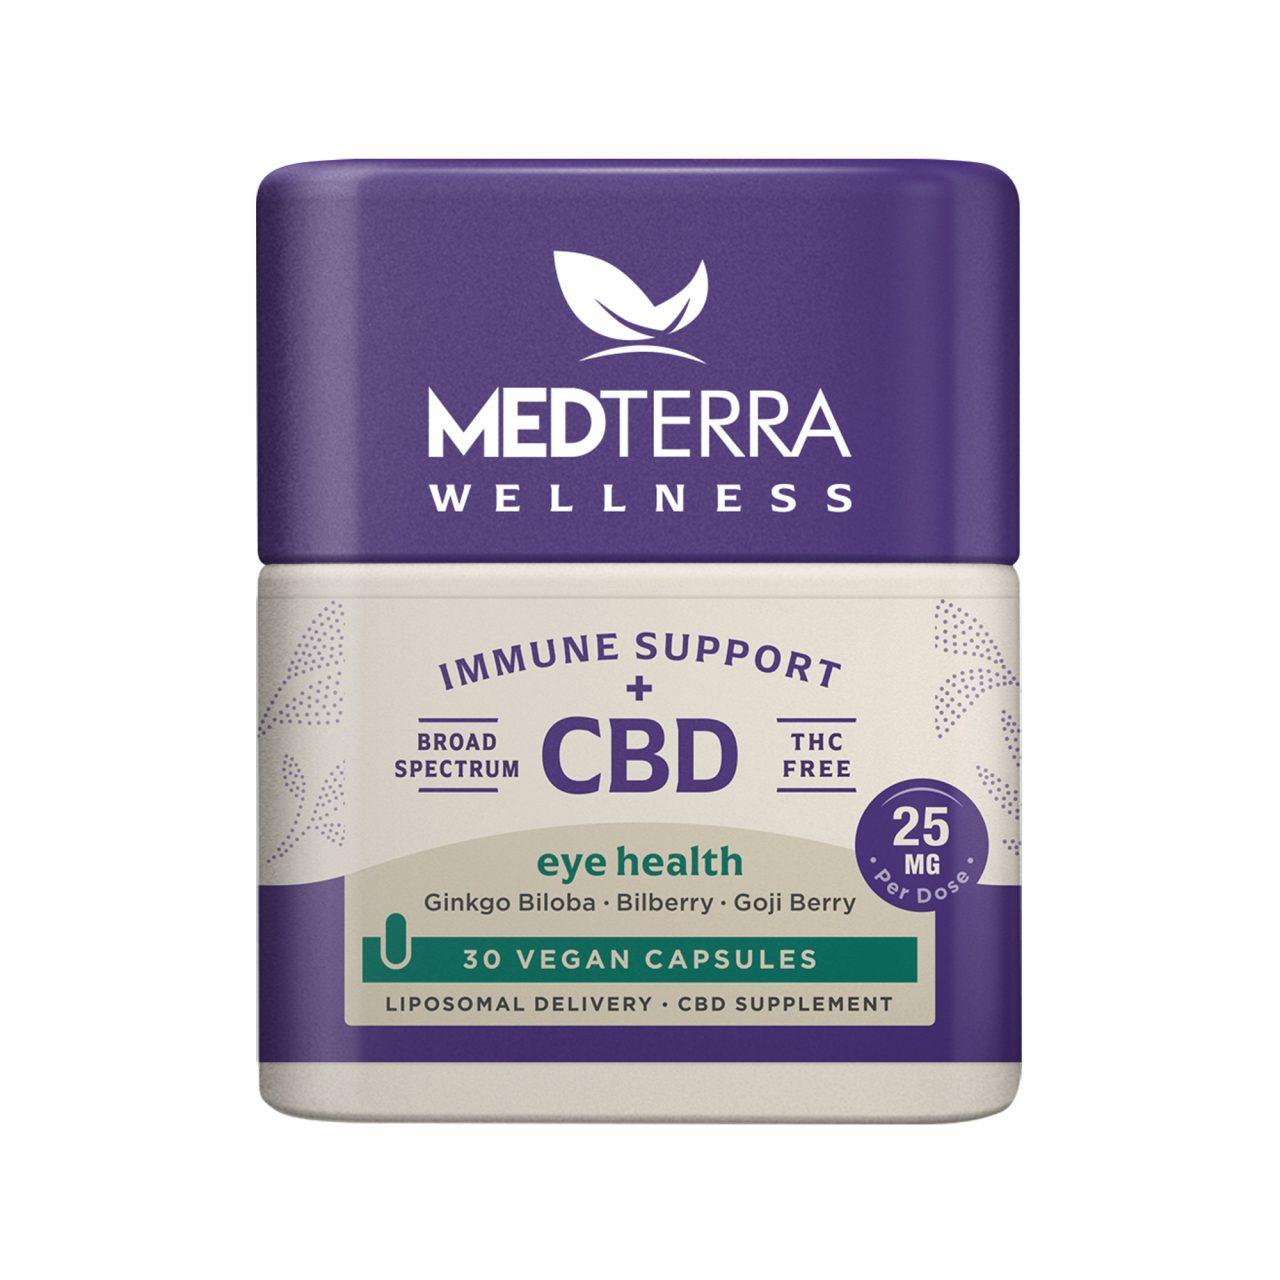 Medterra, Wellness CBD Capsules, Eye Health, Broad Spectrum THC-Free, 30ct, 750mg CBD 1